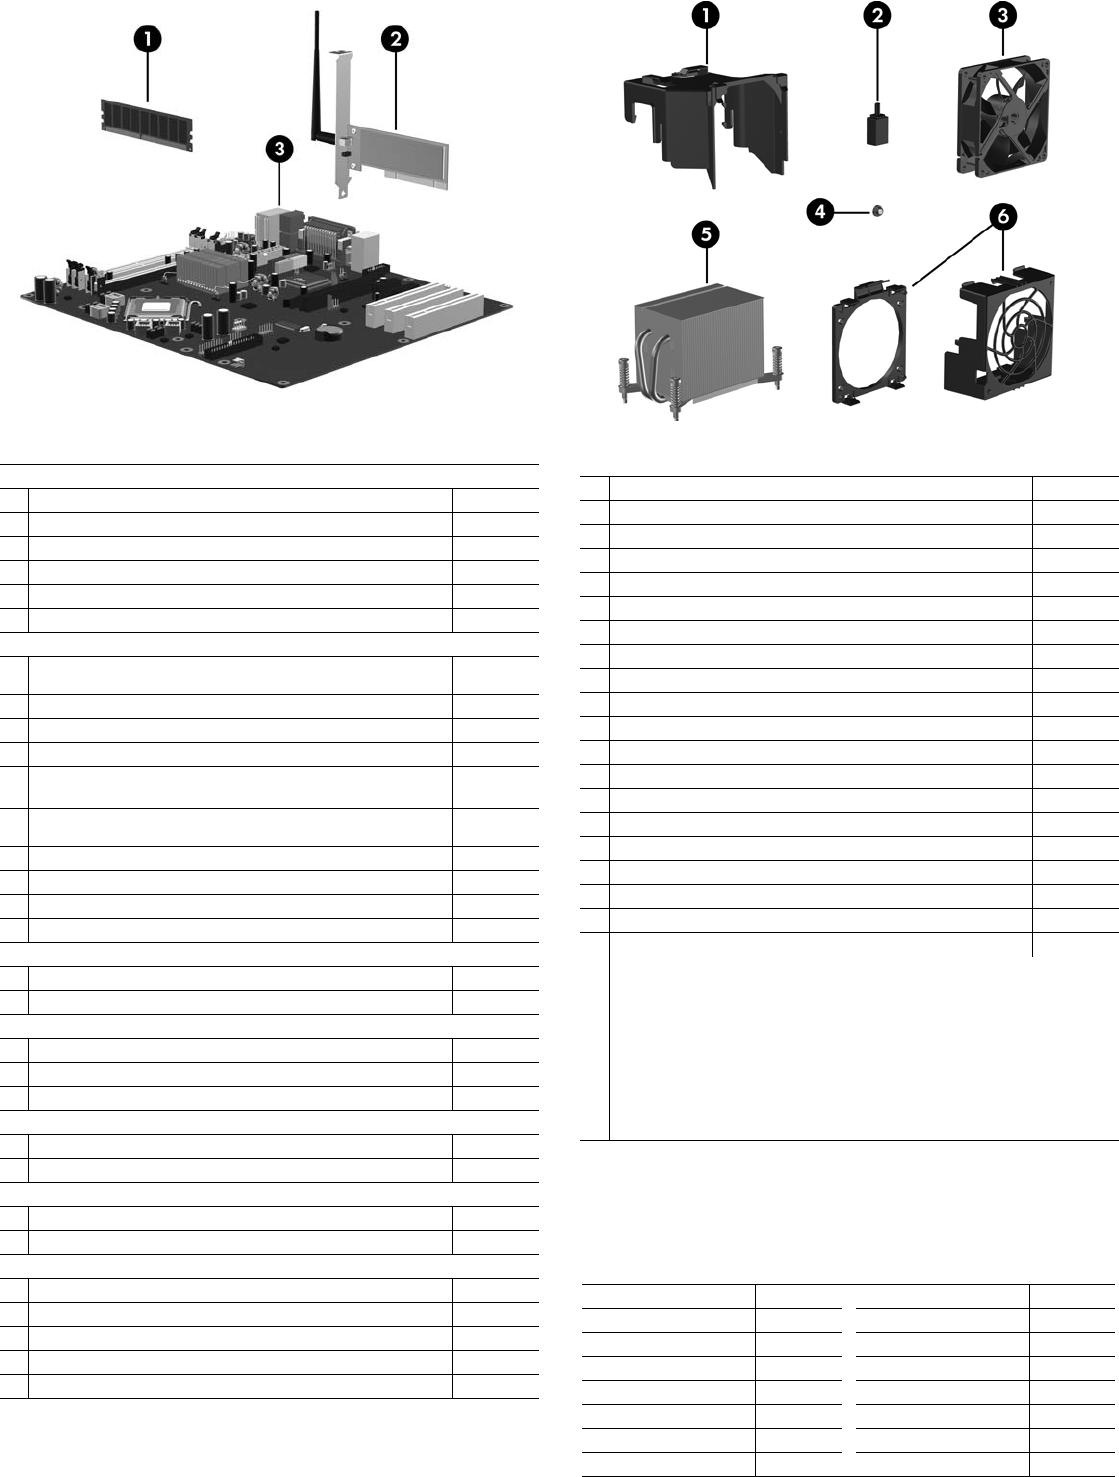 Hp Dc7800 Pci Serial Port Drivers Windows 7